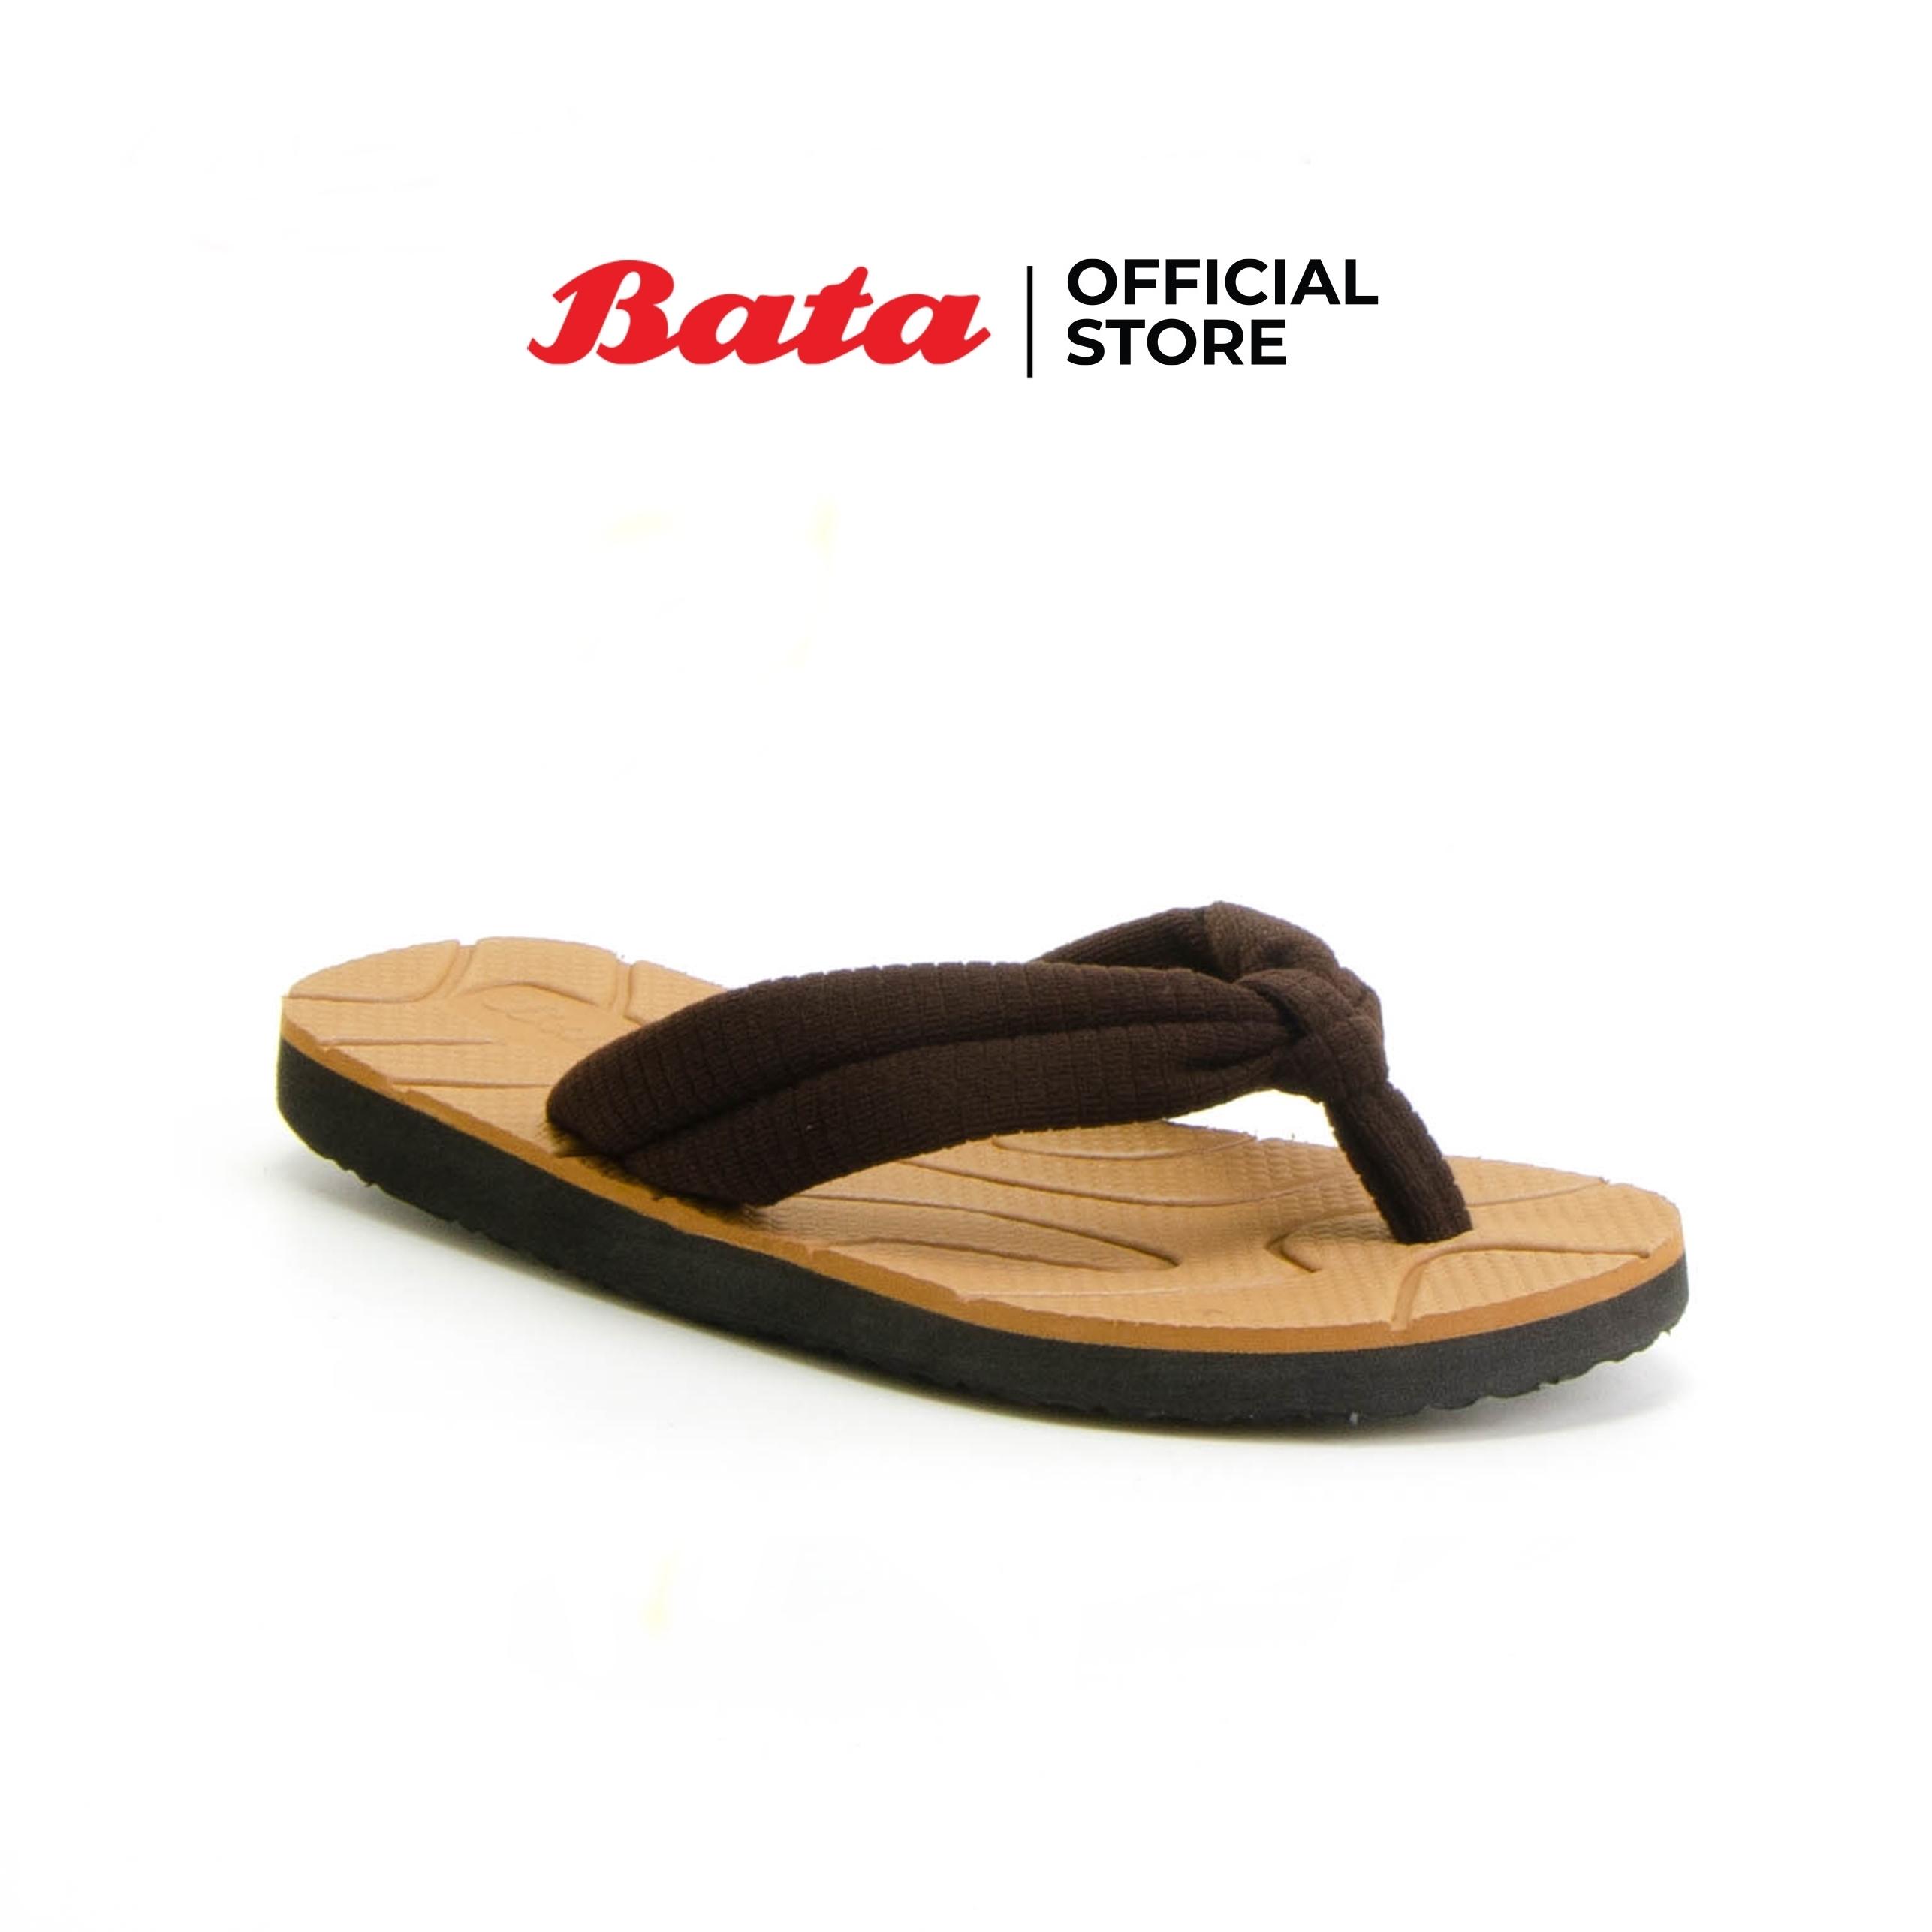 Bata รองเท้าแตะ ส้นแบน ผู้หญิง แบบหูคีบ สีน้ำตาล รหัส 5794258 Ladiesflat Fashion Summer.